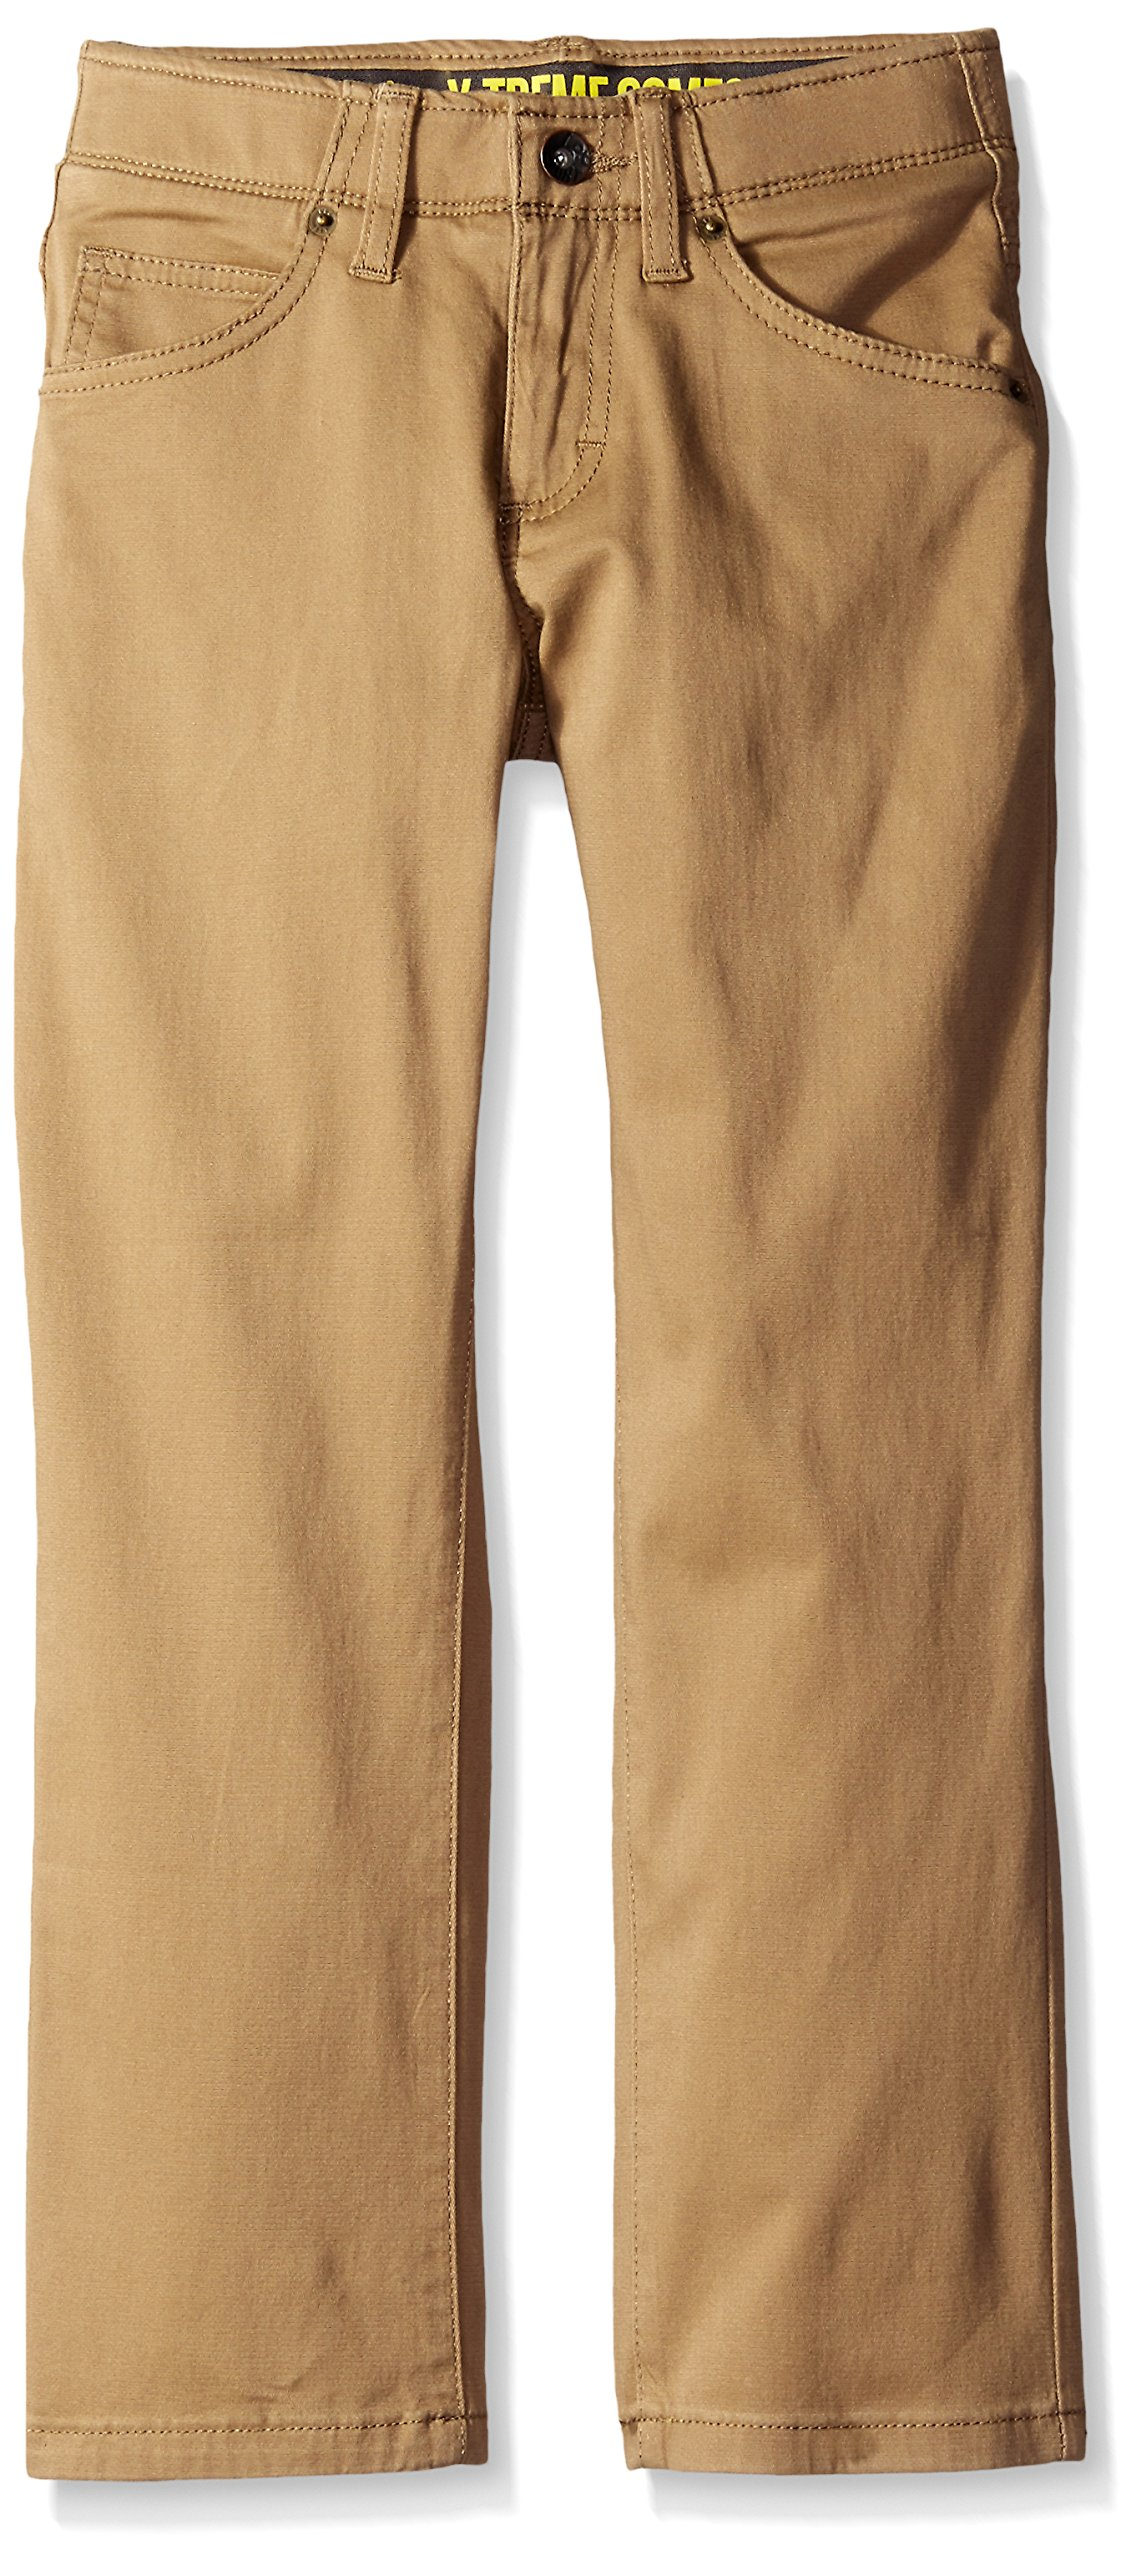 Lee Boys' Sport X-Treme Comfort Slim Jeans, Original Khaki, 20 Husky